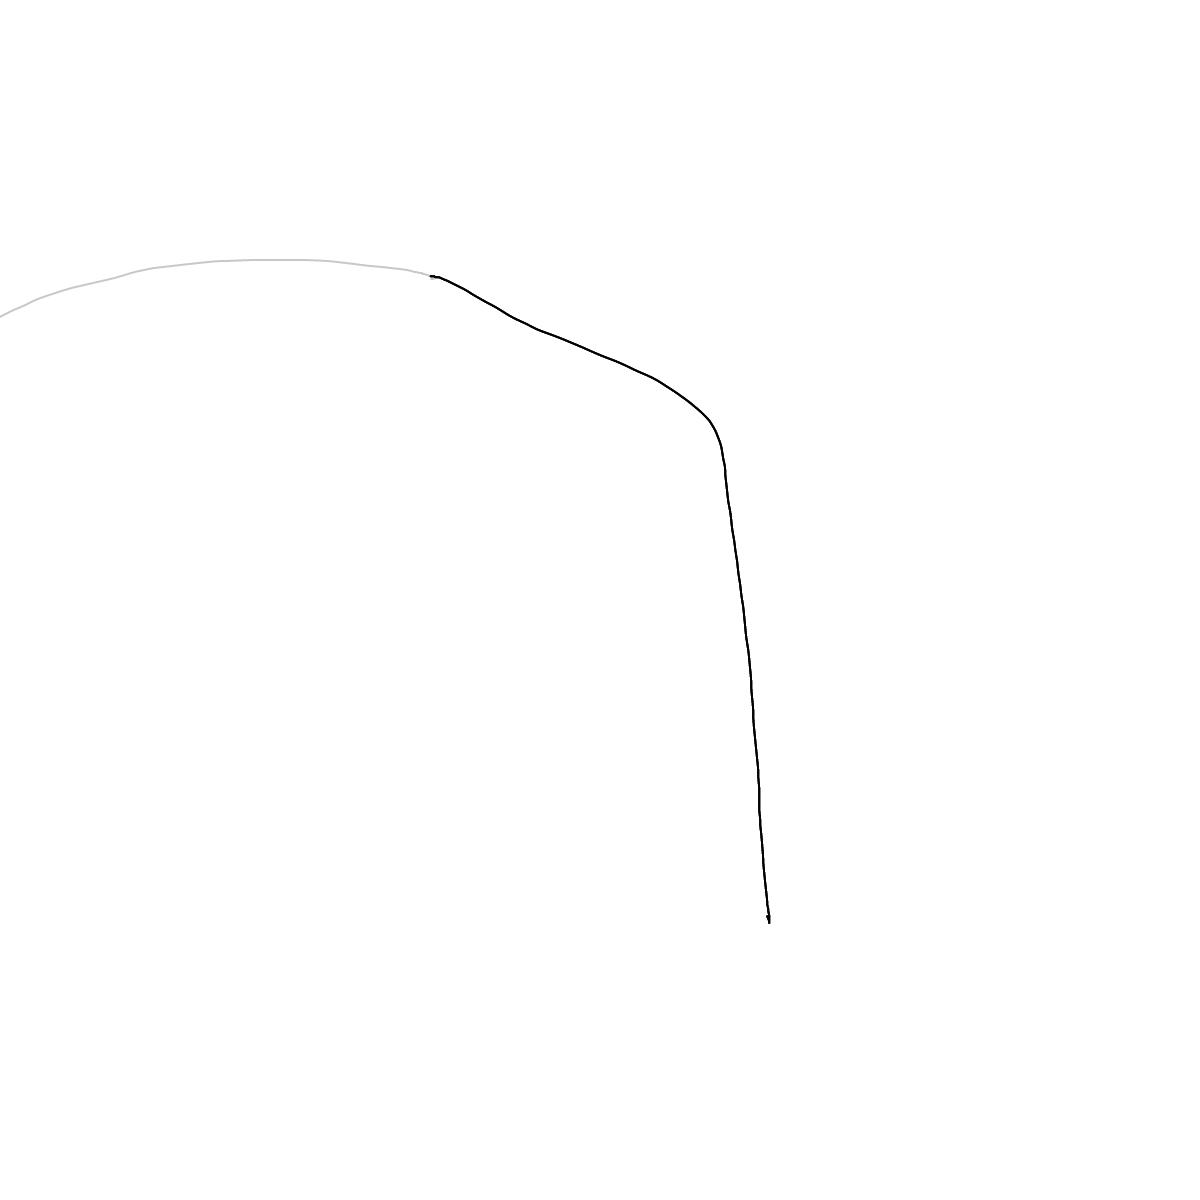 BAAAM drawing#14780 lat:52.4754524230957000lng: 13.4063348770141600